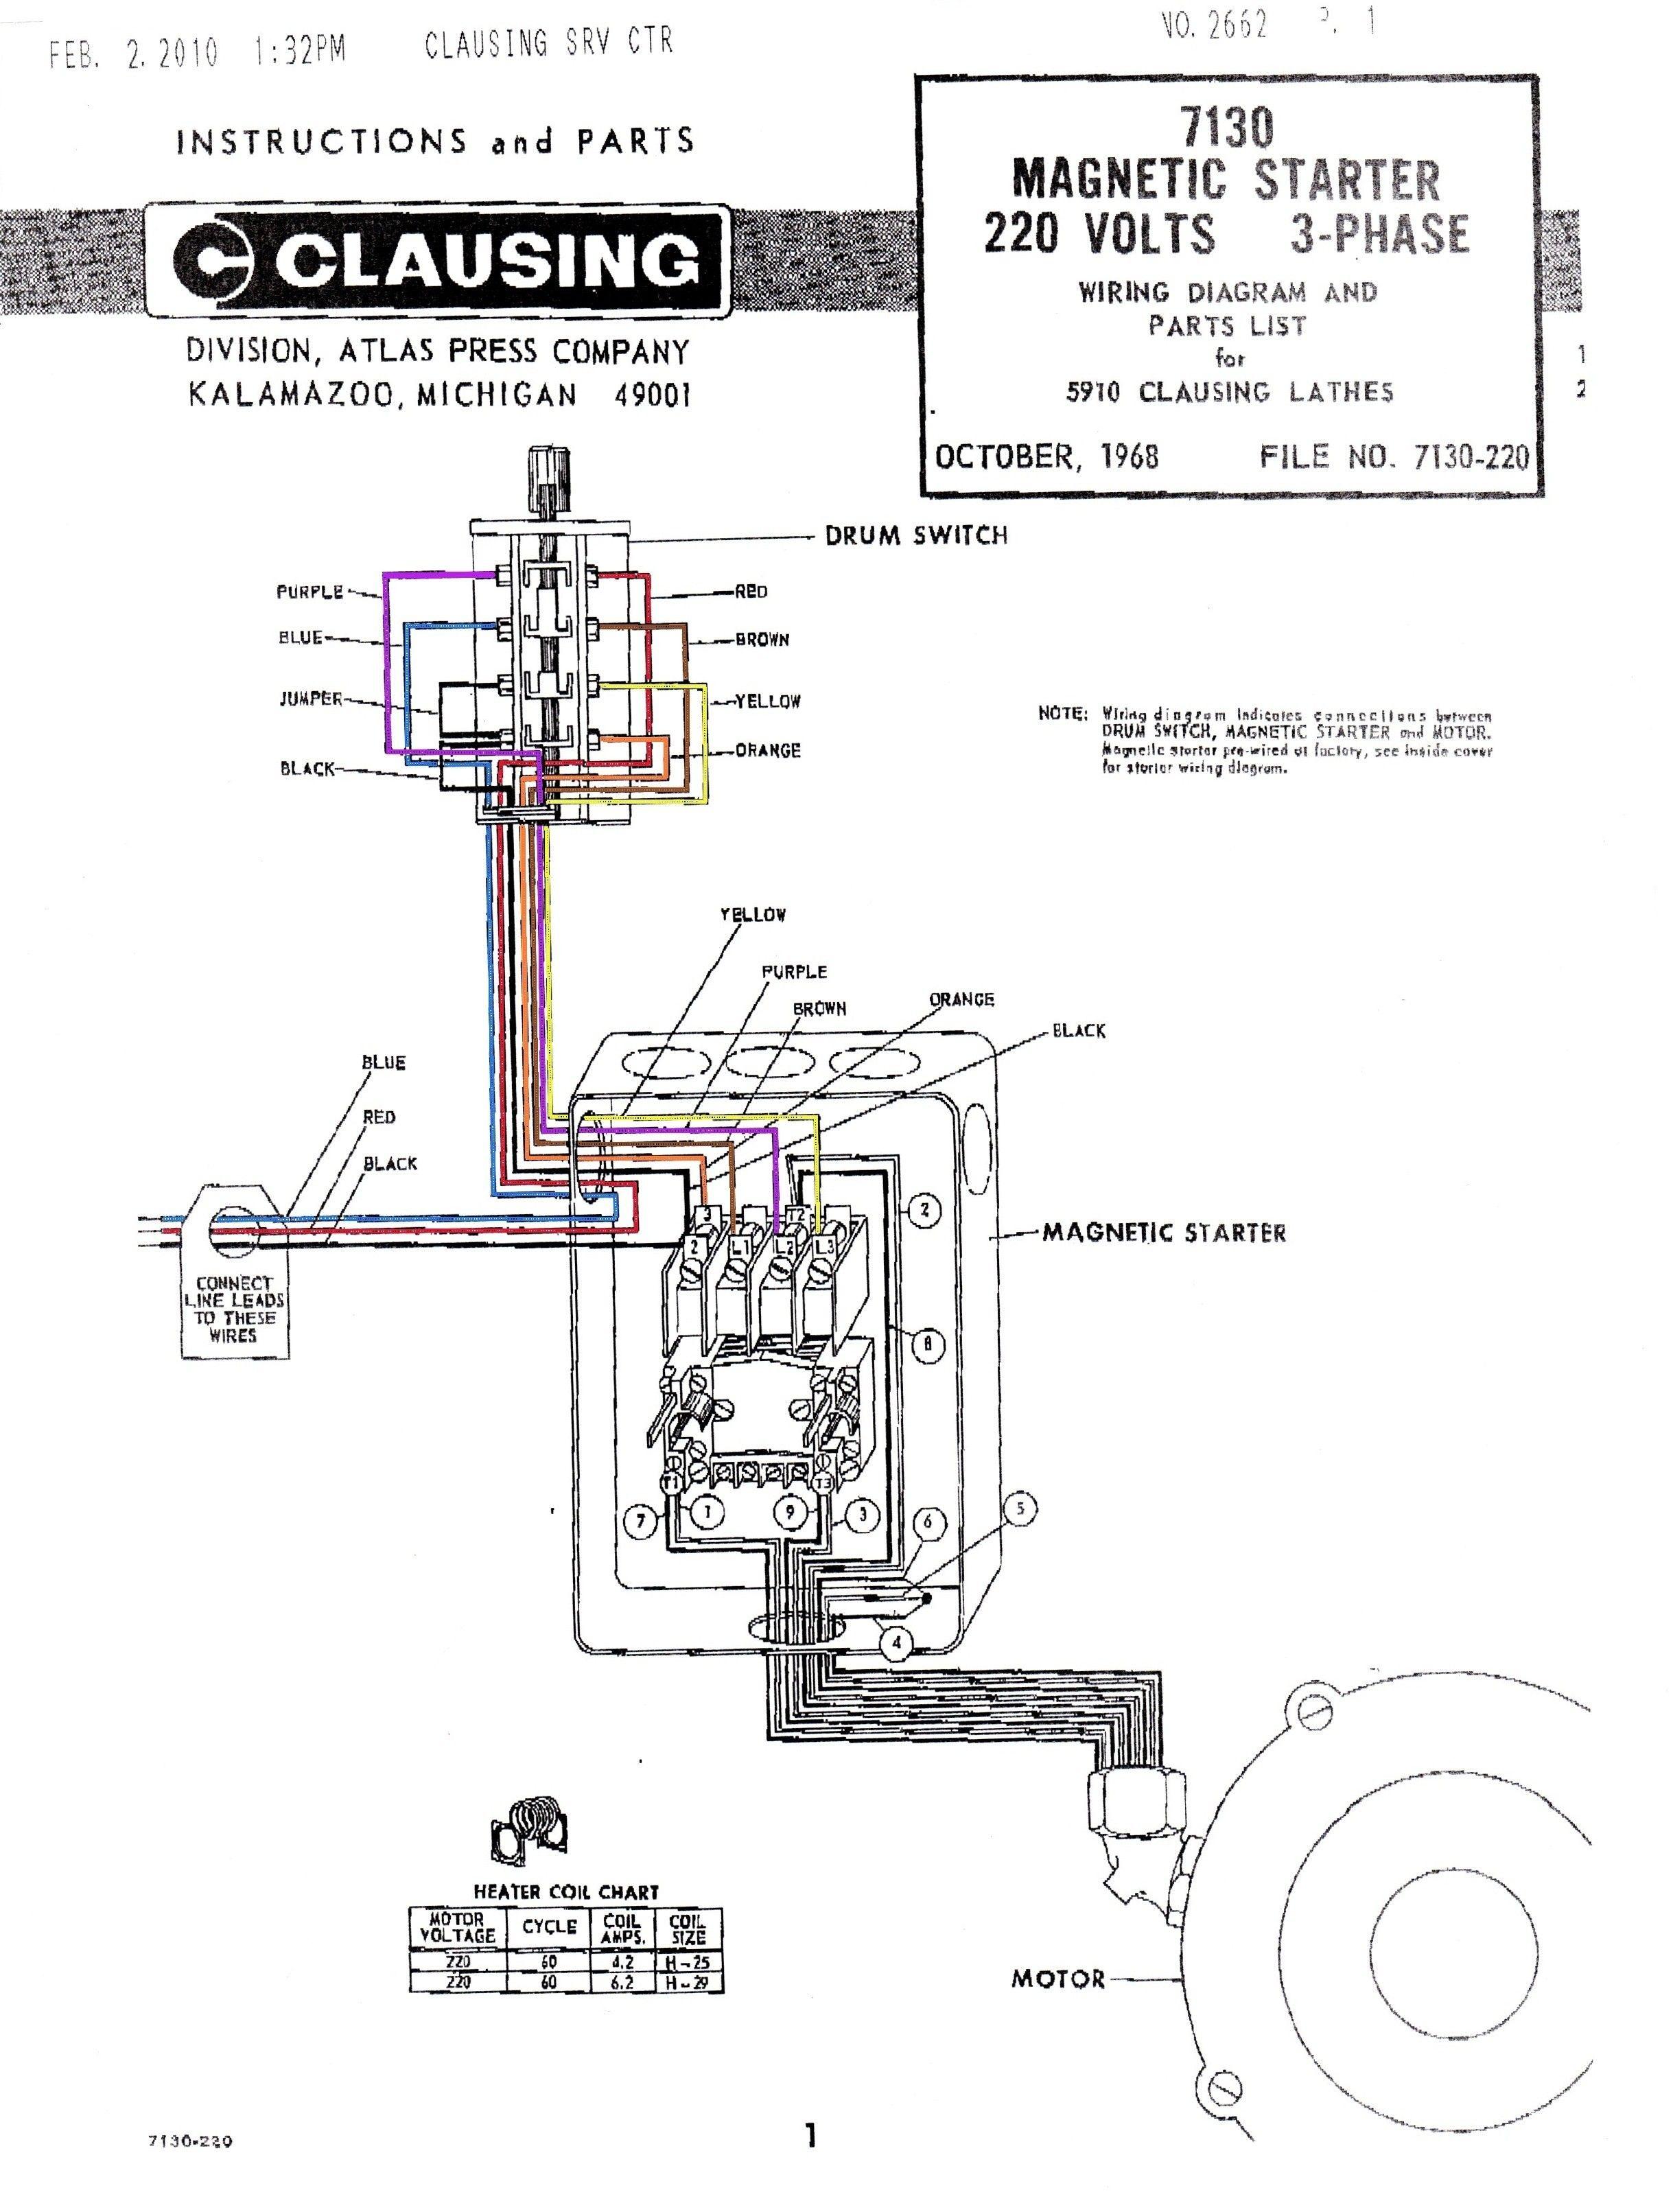 Ge Motor Wiring Diagram : motor, wiring, diagram, Inspirational, Motor, Starter, Wiring, Diagram, Diagram,, Wire,, Bathroom, Installation